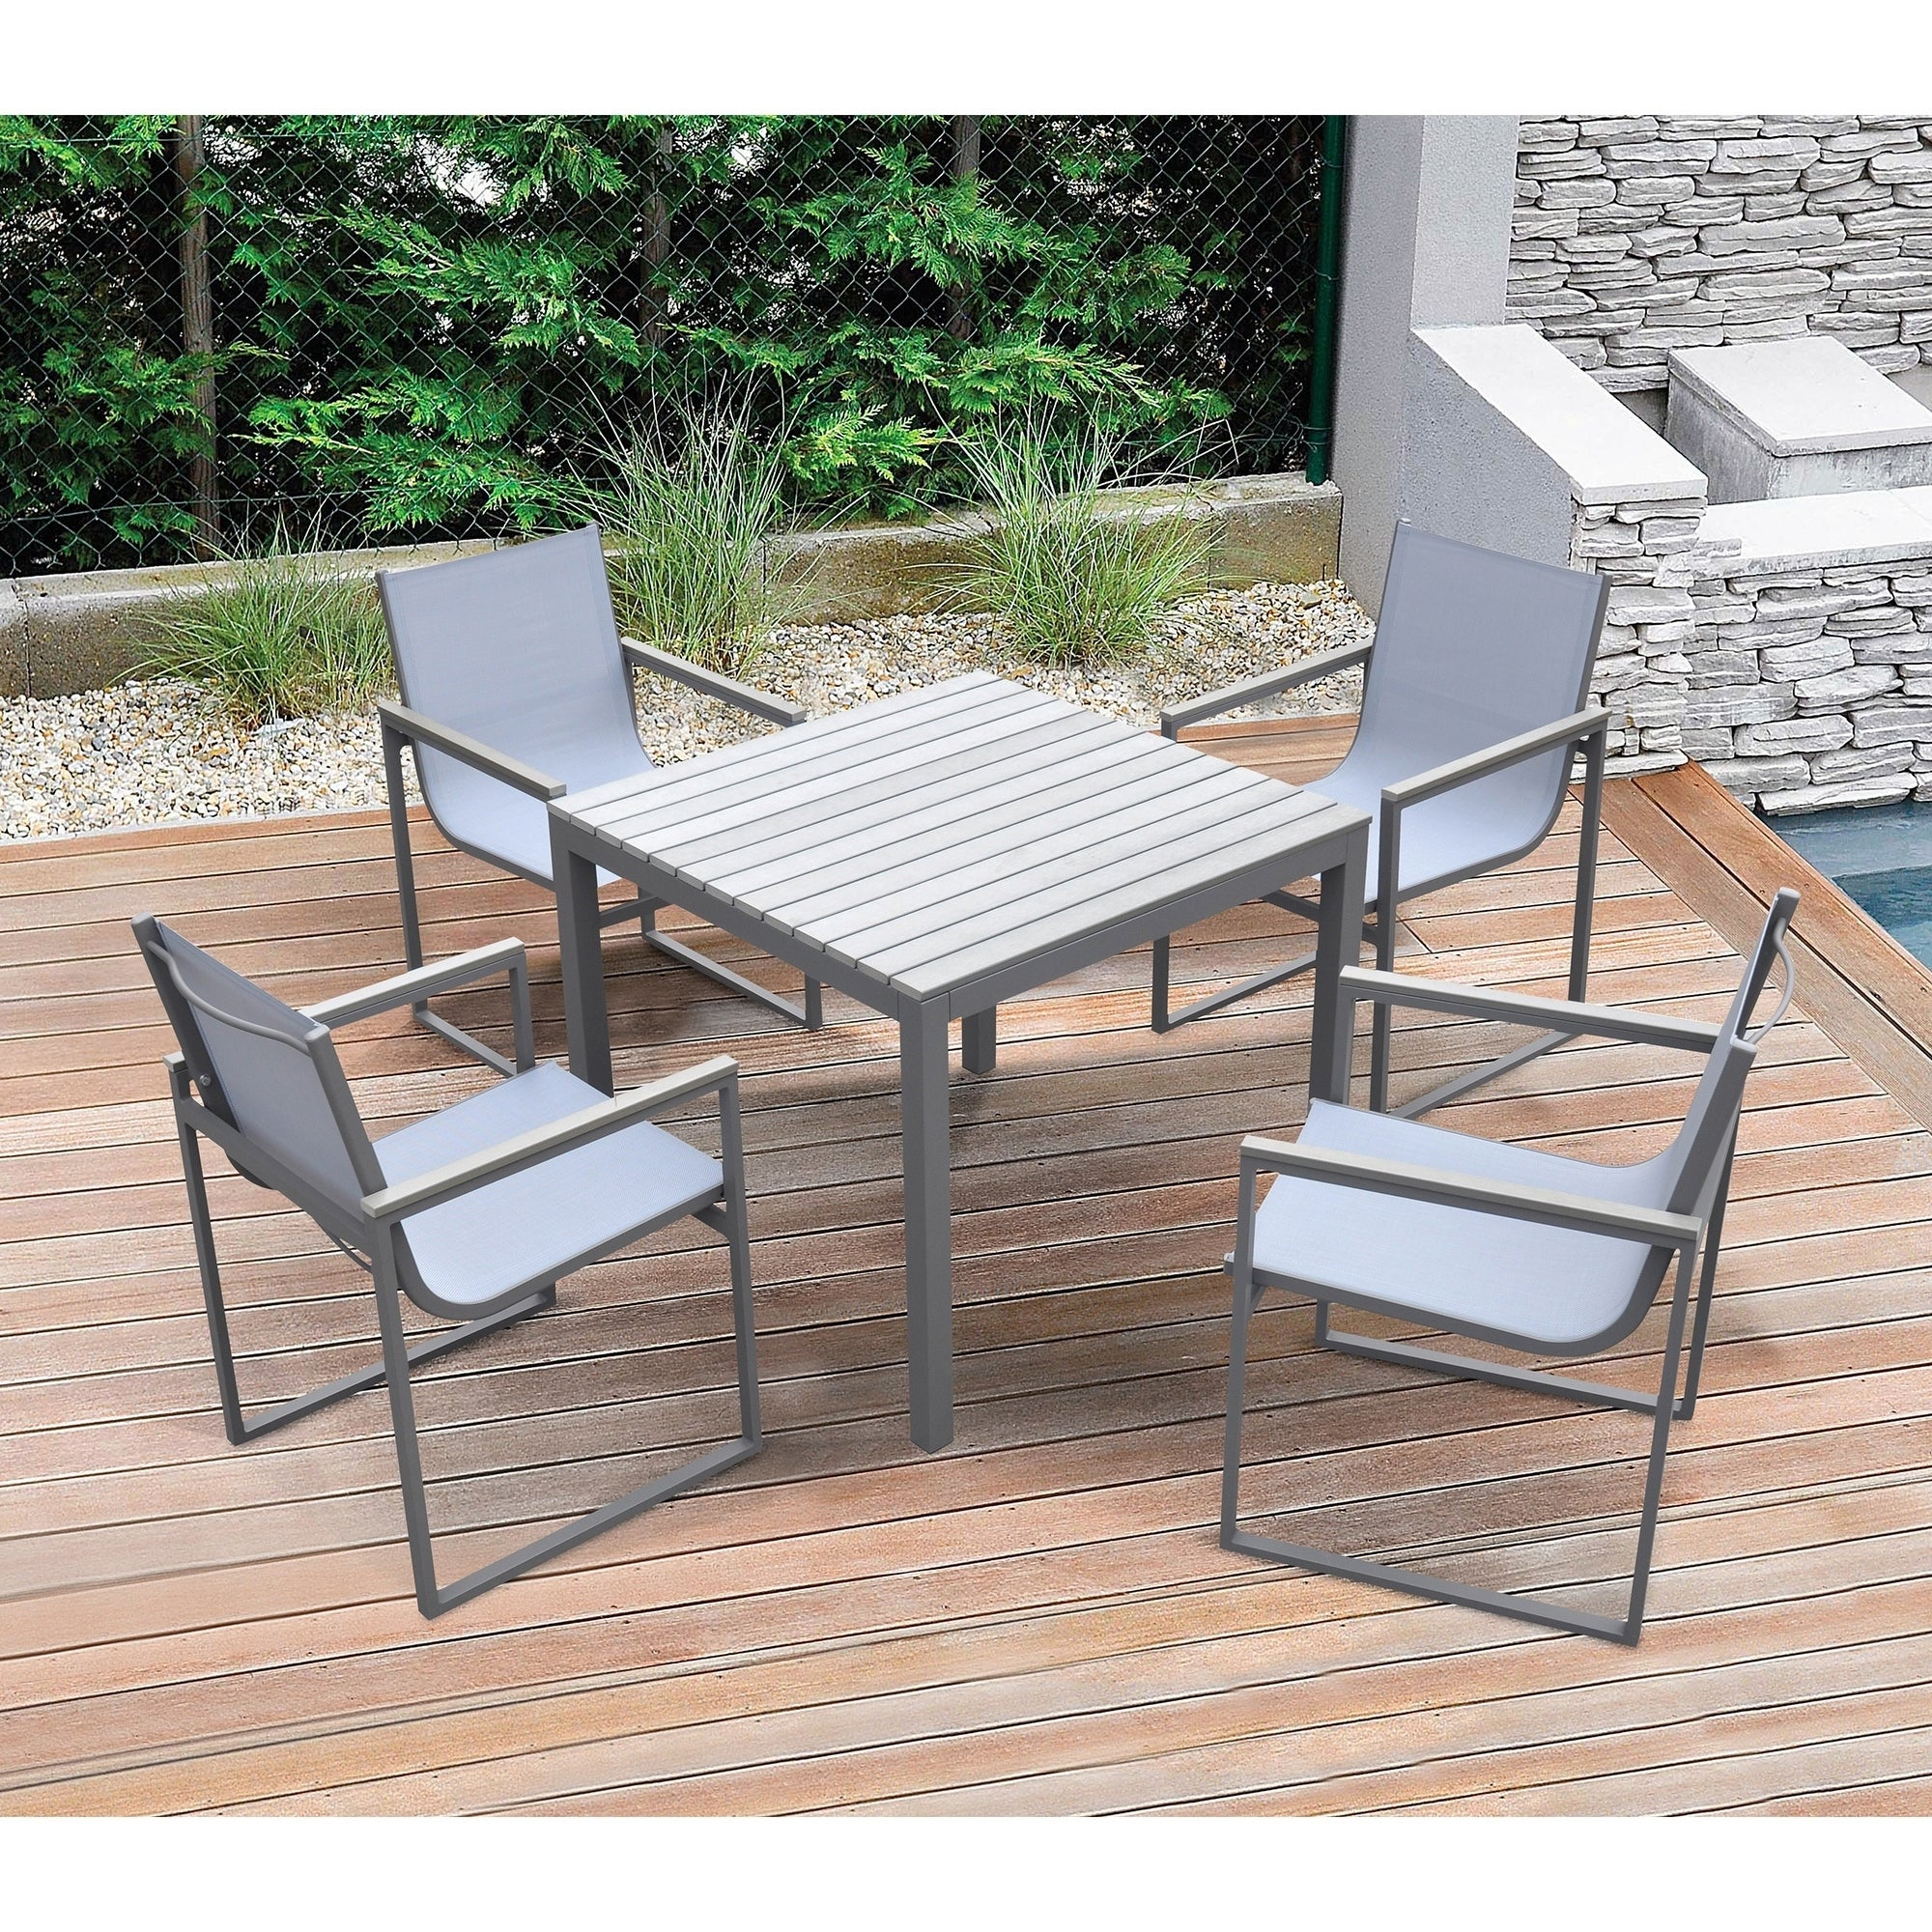 Strange Armen Living Patio Furniture Find Great Outdoor Seating Interior Design Ideas Skatsoteloinfo